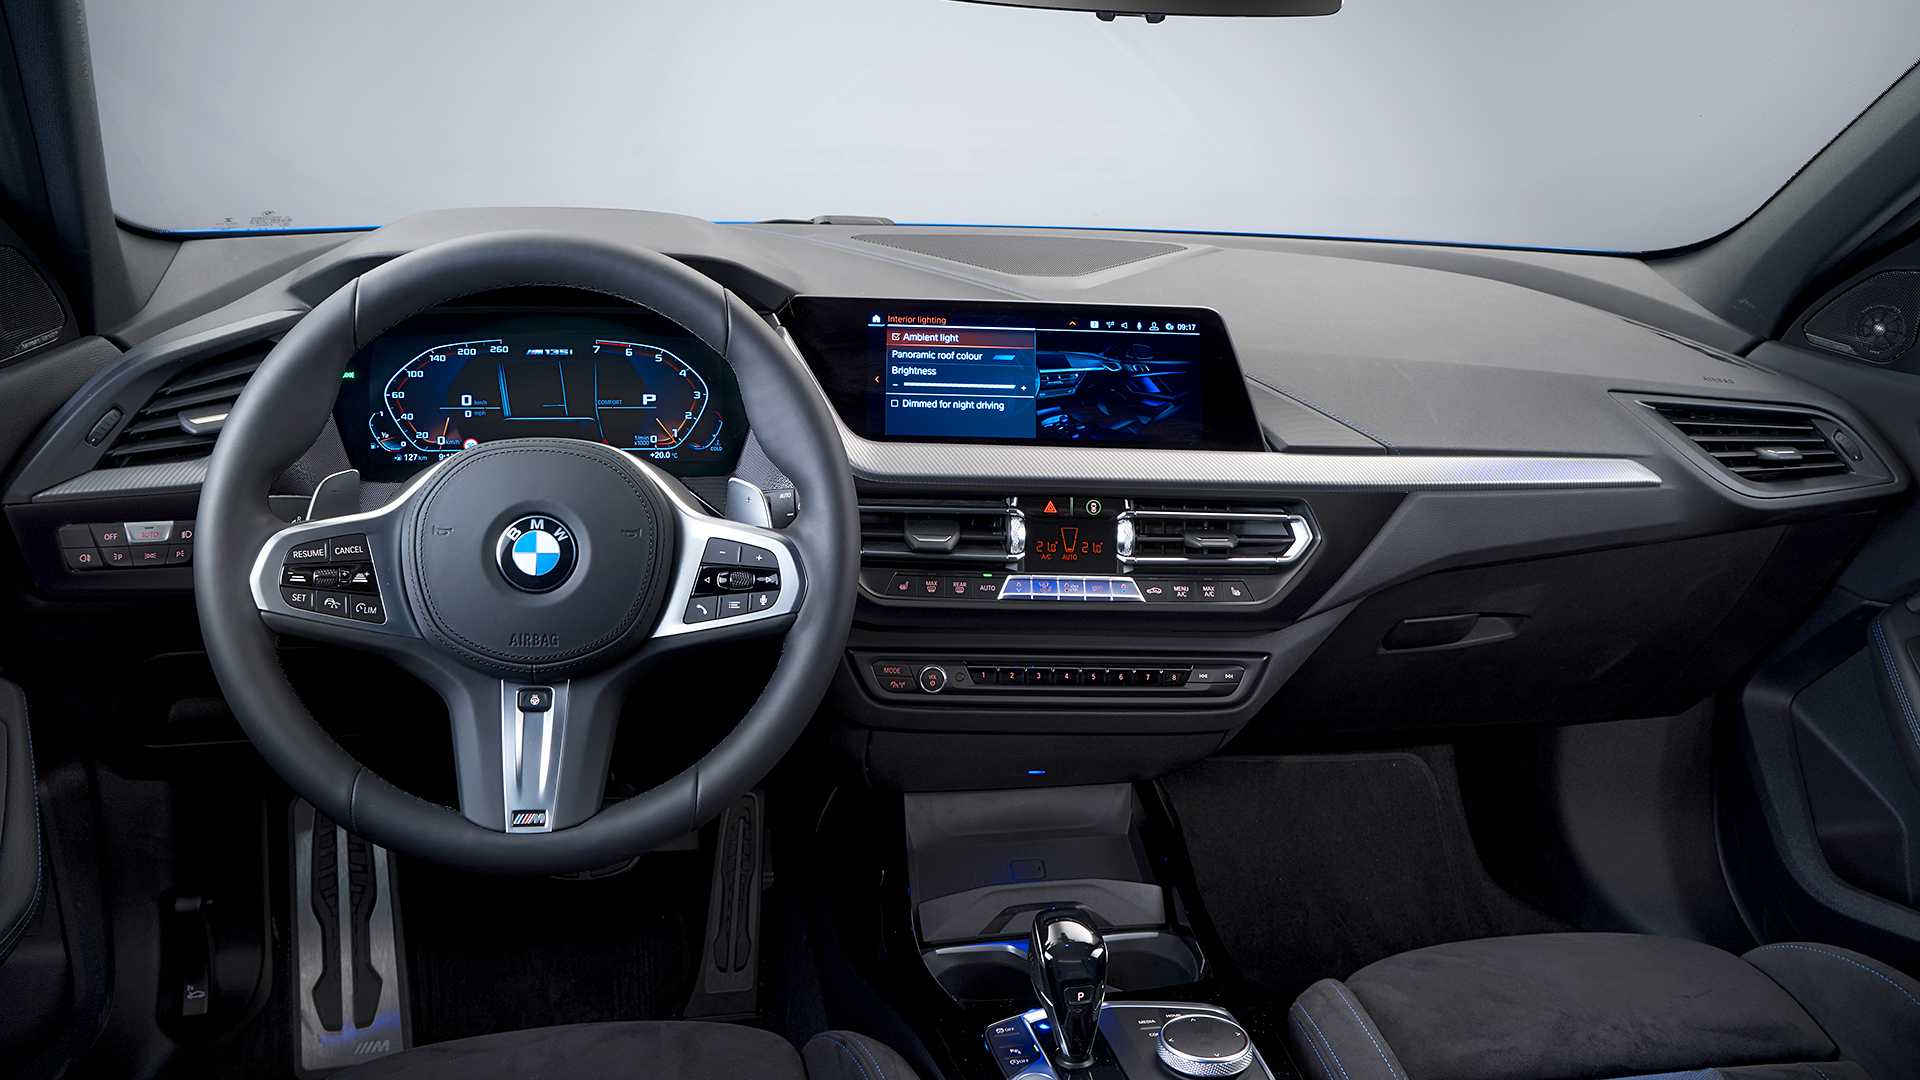 2020 Bmw M135i Xdrive Color Misano Blue Metallic Interior Cockpit Wallpapers 47 Newcarcars